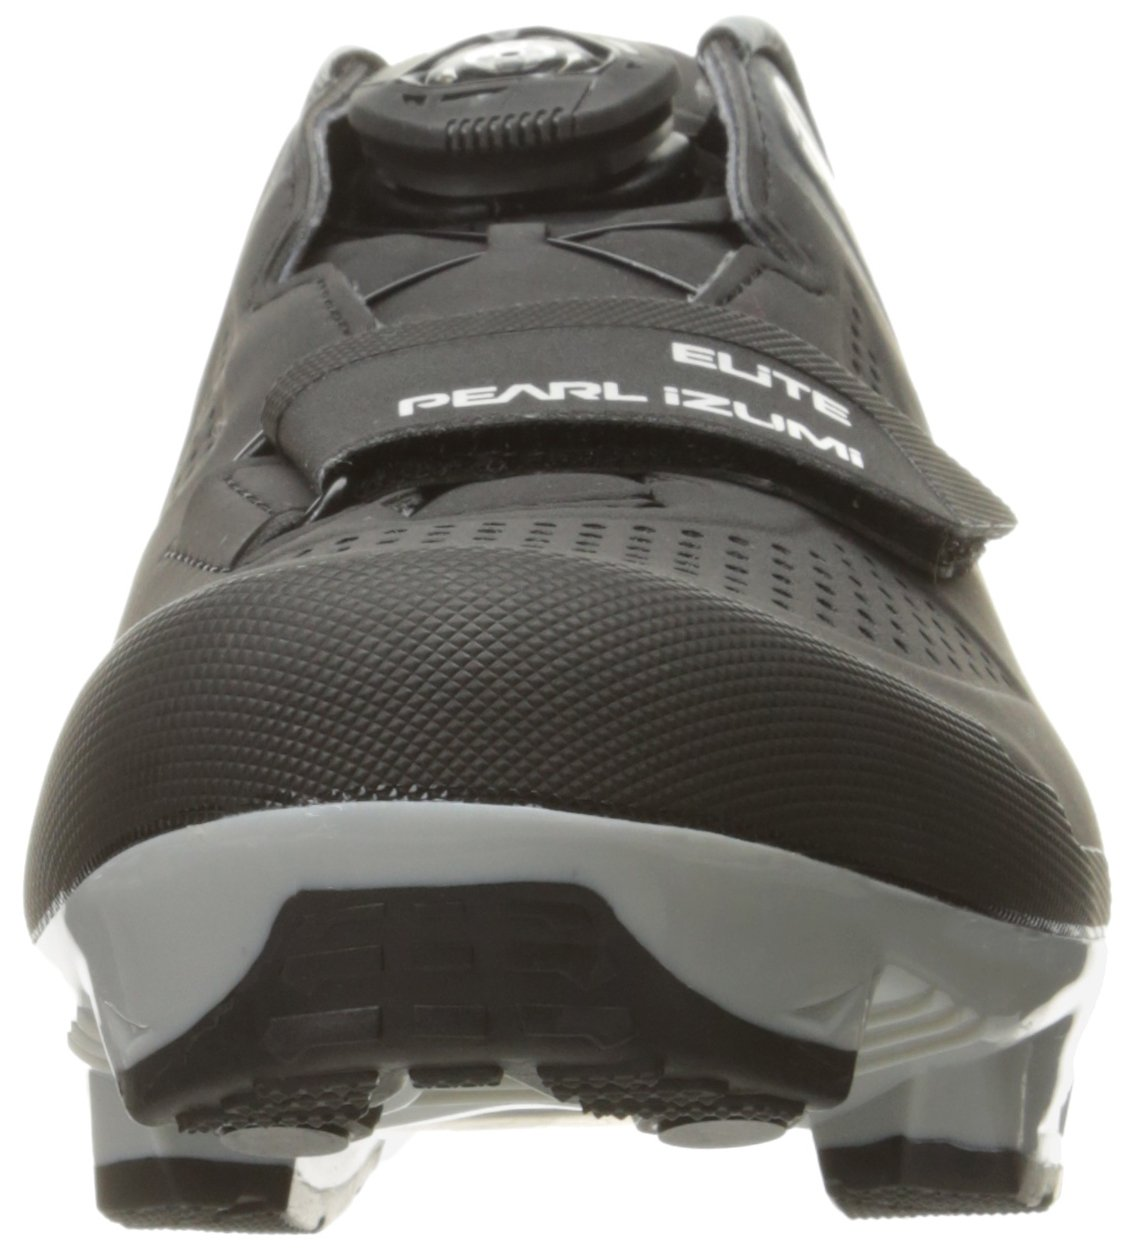 Pearl Izumi Women's w x-Project Elite Cycling Shoe, Black/Monument Grey, 40 EU/8.4 B US by Pearl iZUMi (Image #4)